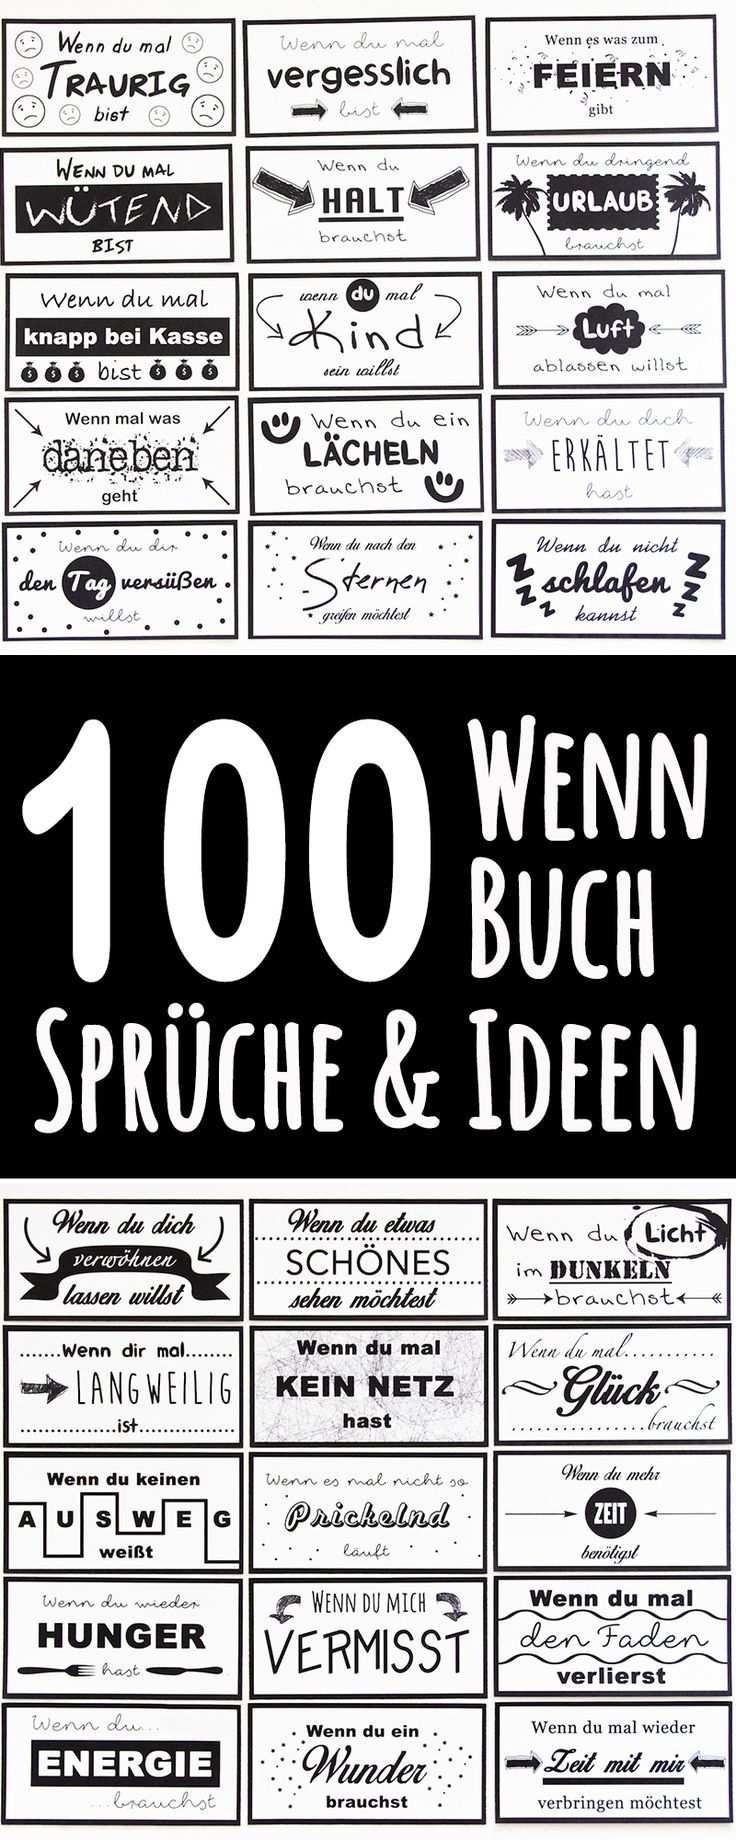 100 Wenn Buch Spruche Wenn Buch Spruche Wenn Buch Weihnachten